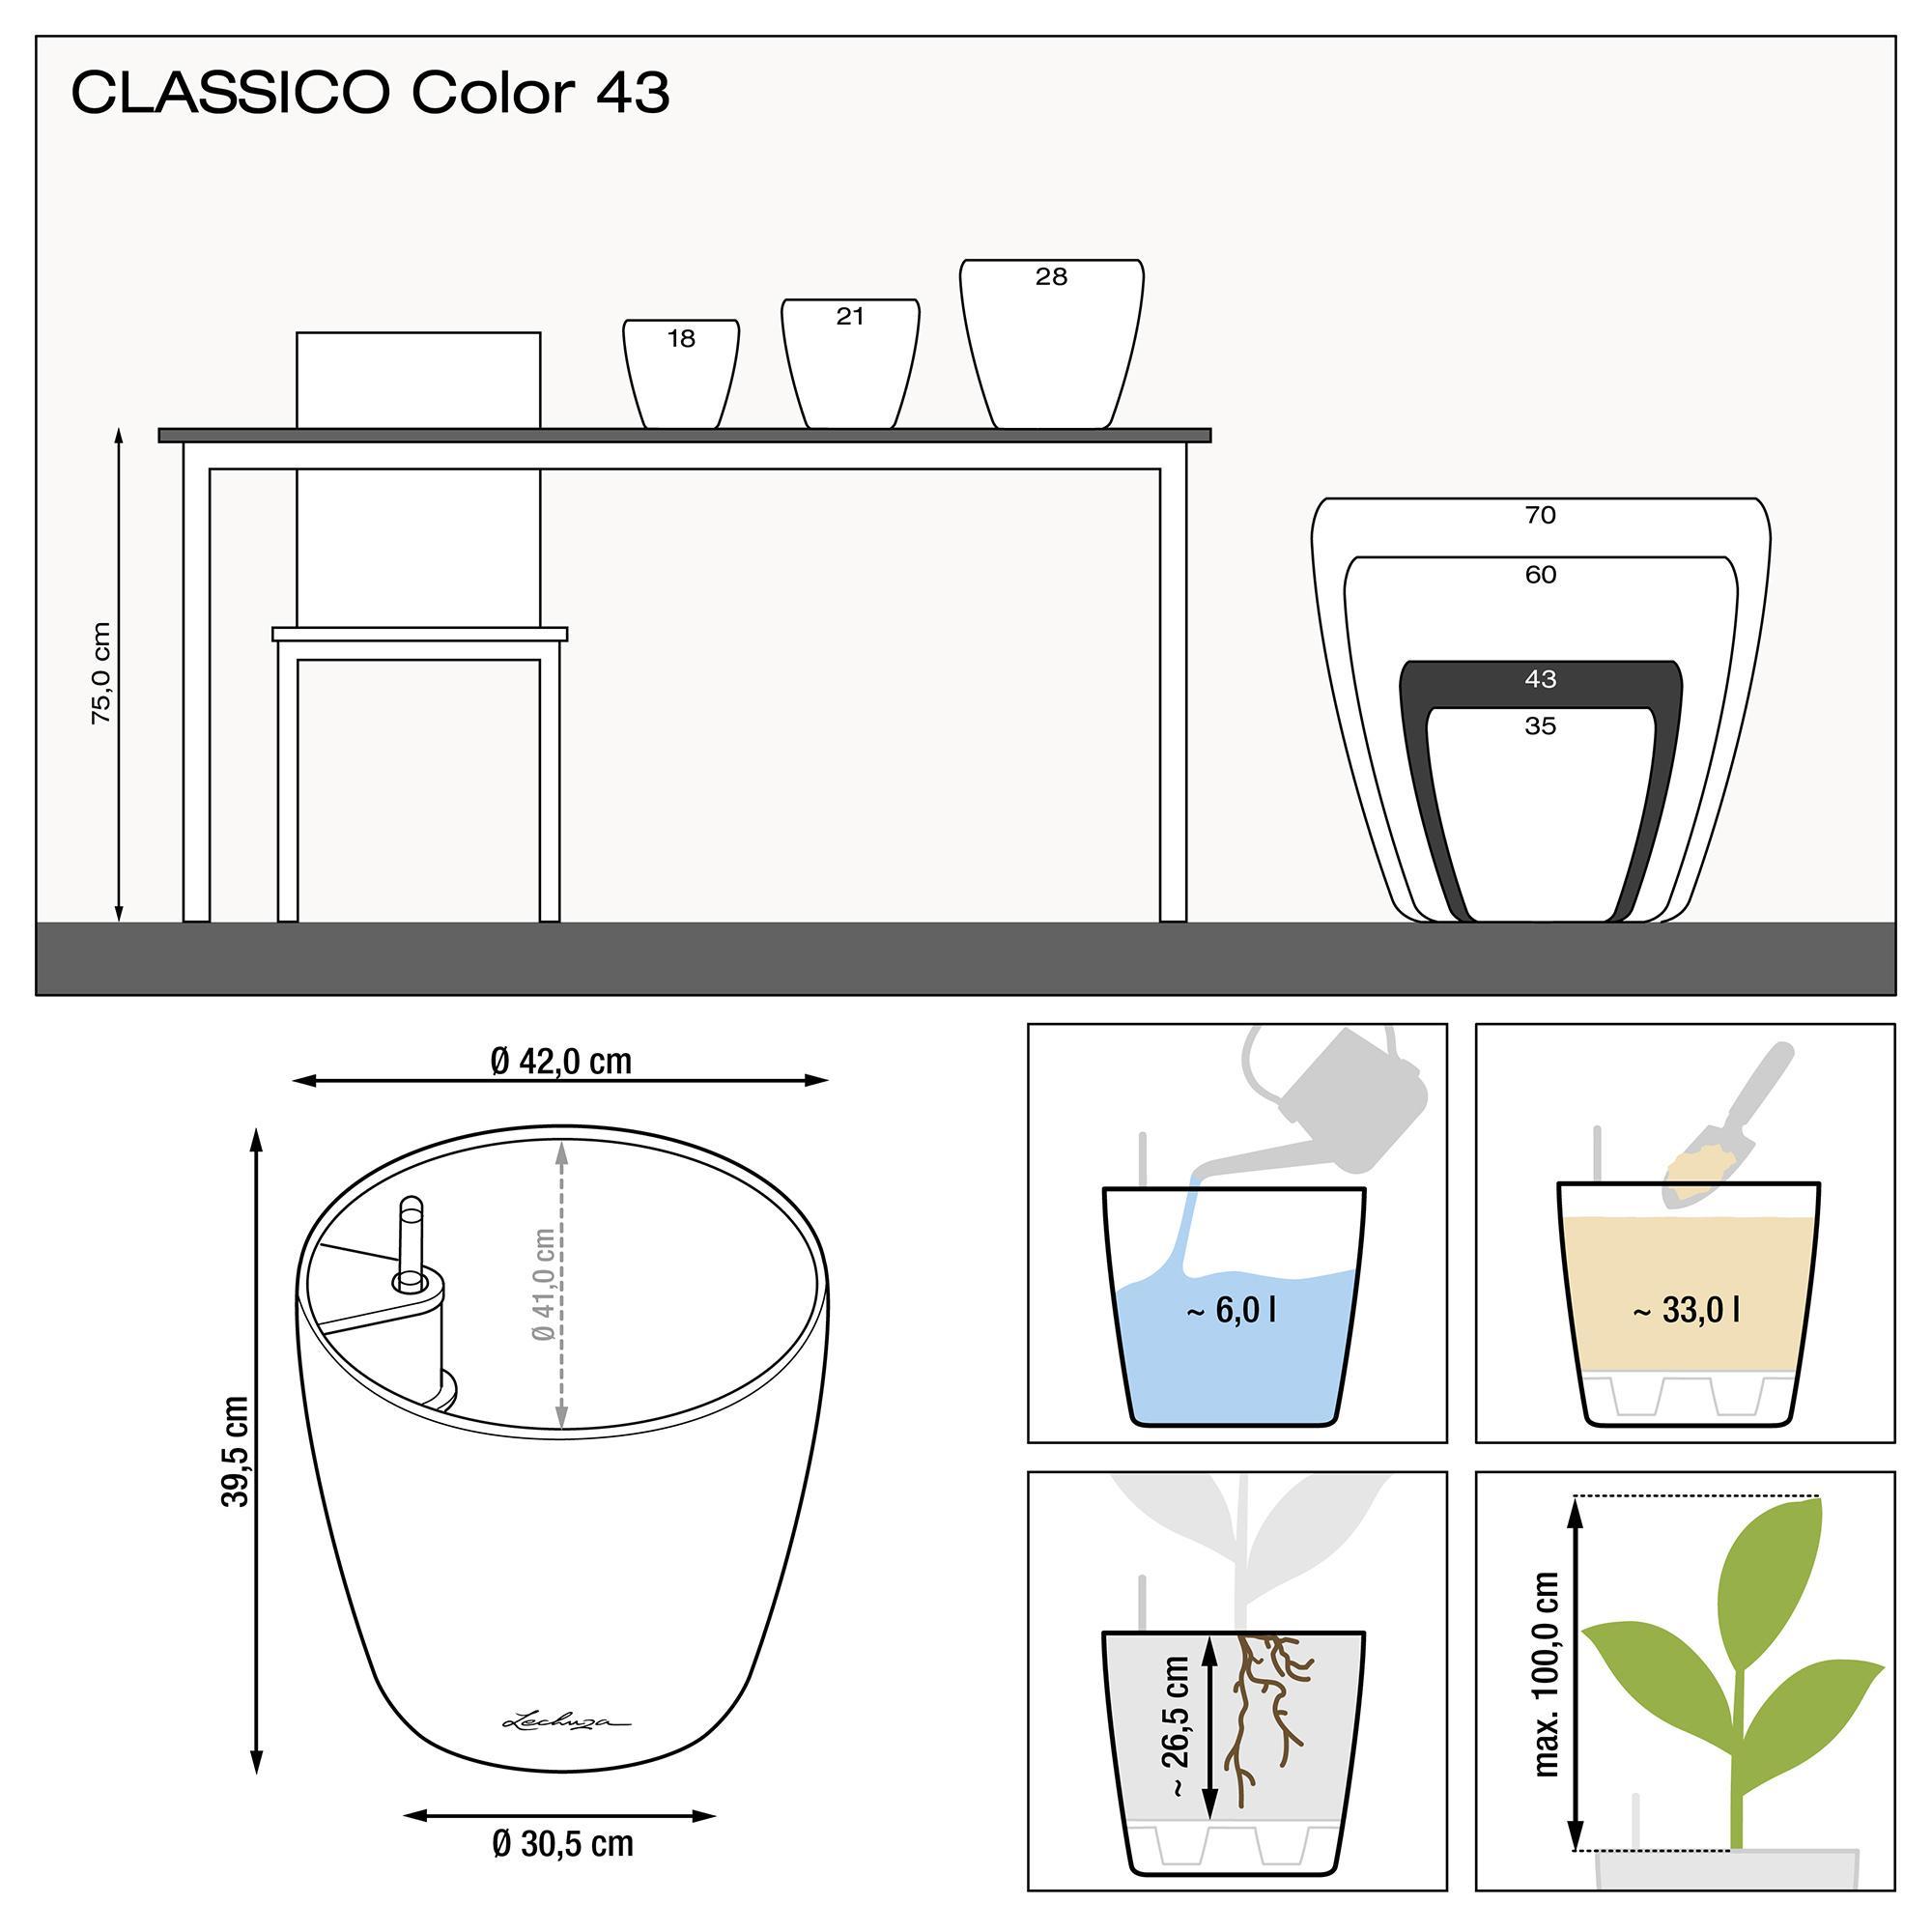 CLASSICO Color 43 blanc - Image 2